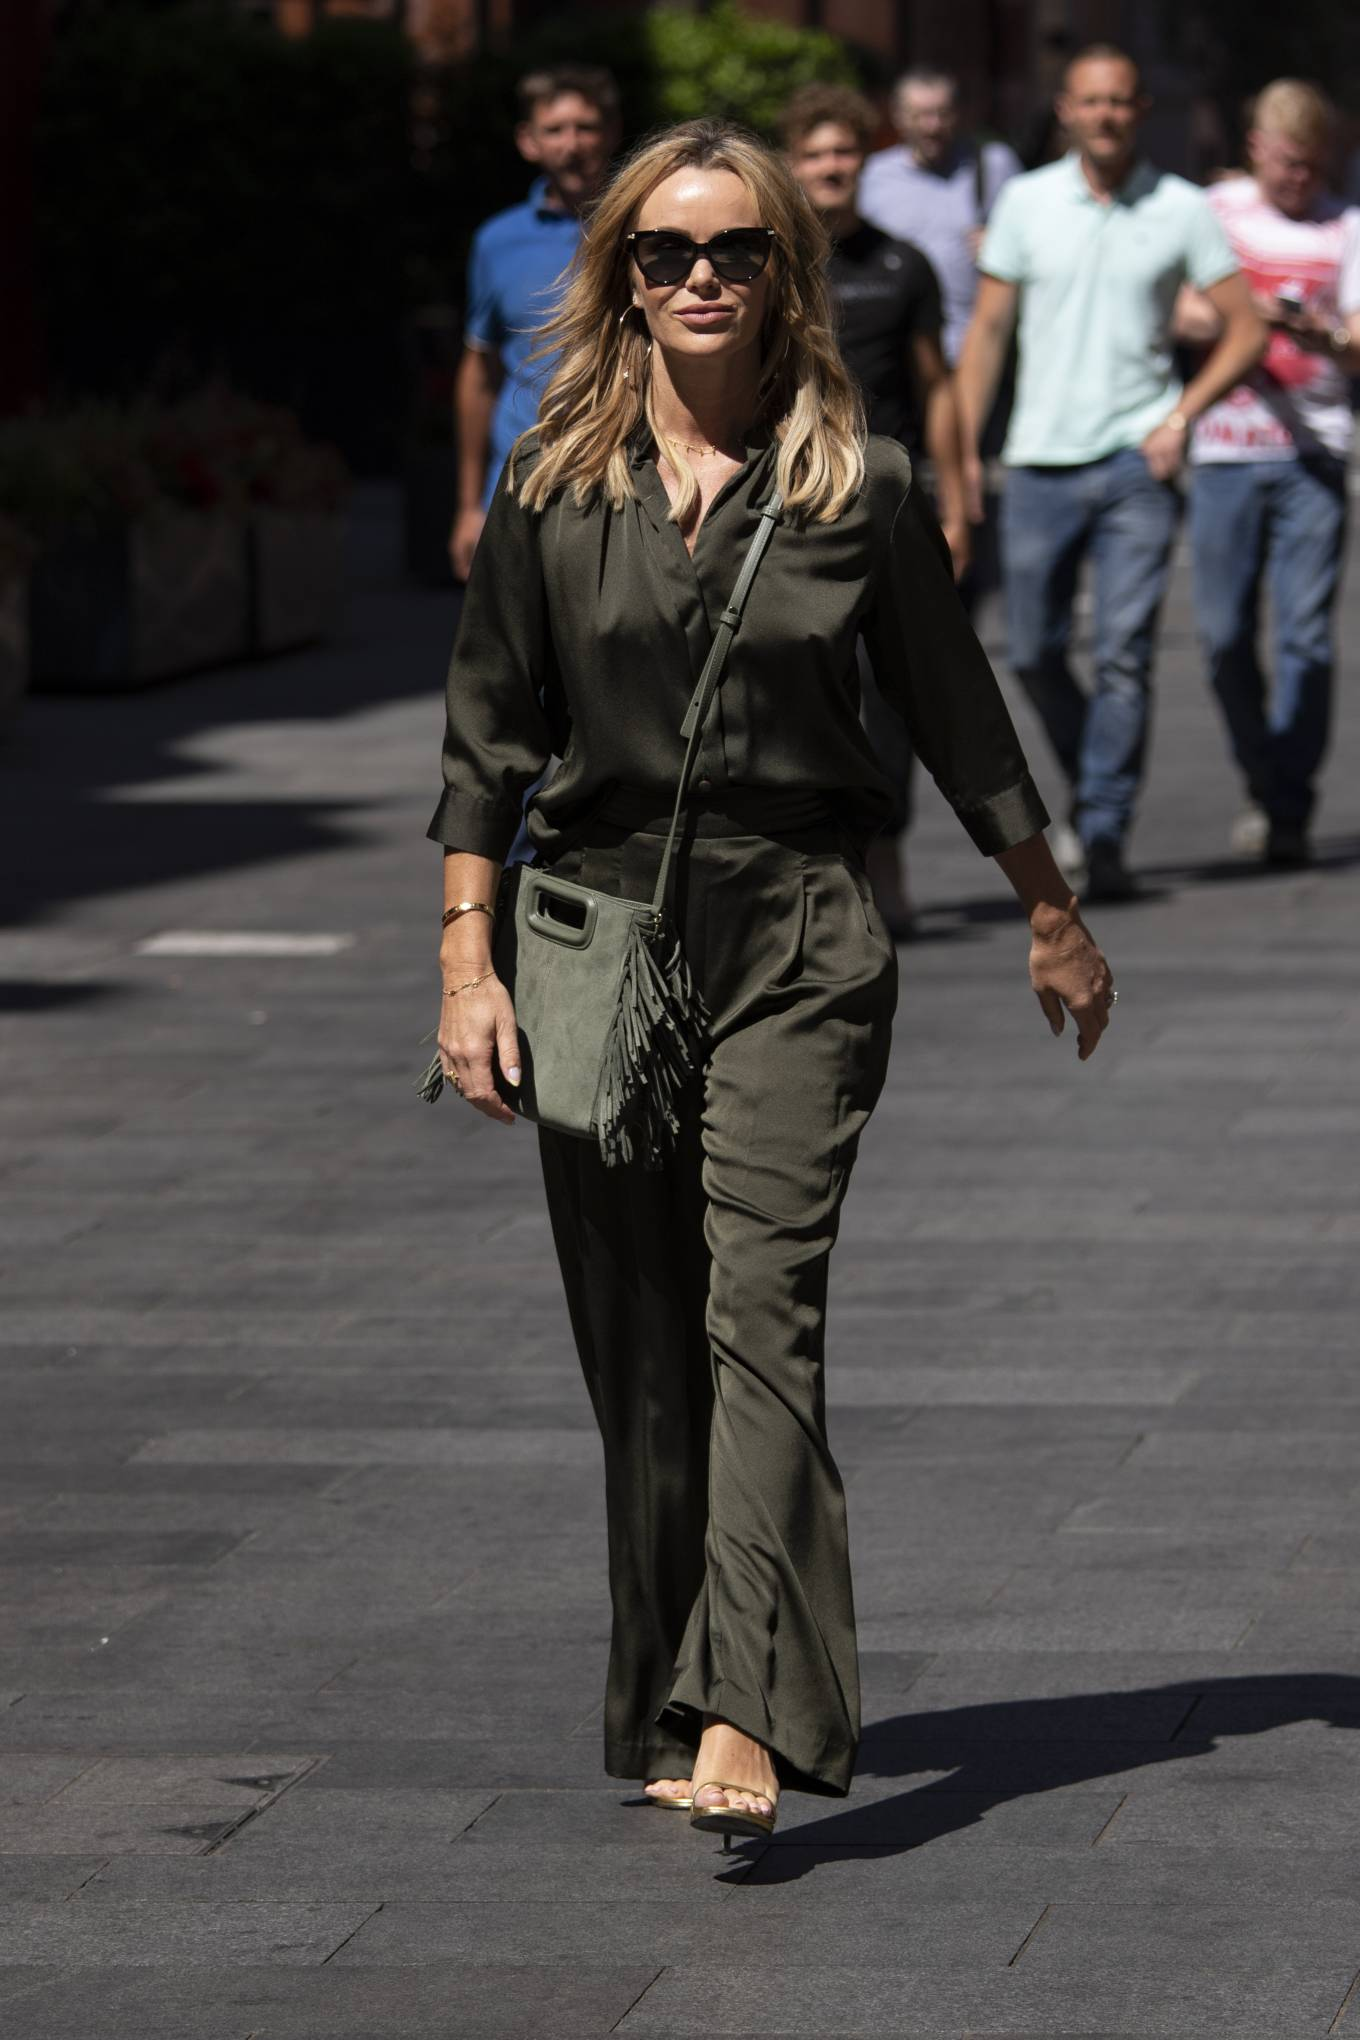 Amanda Holden 2021 : Amanda Holden – Seen leaving Global Radio in Leicester Square-02